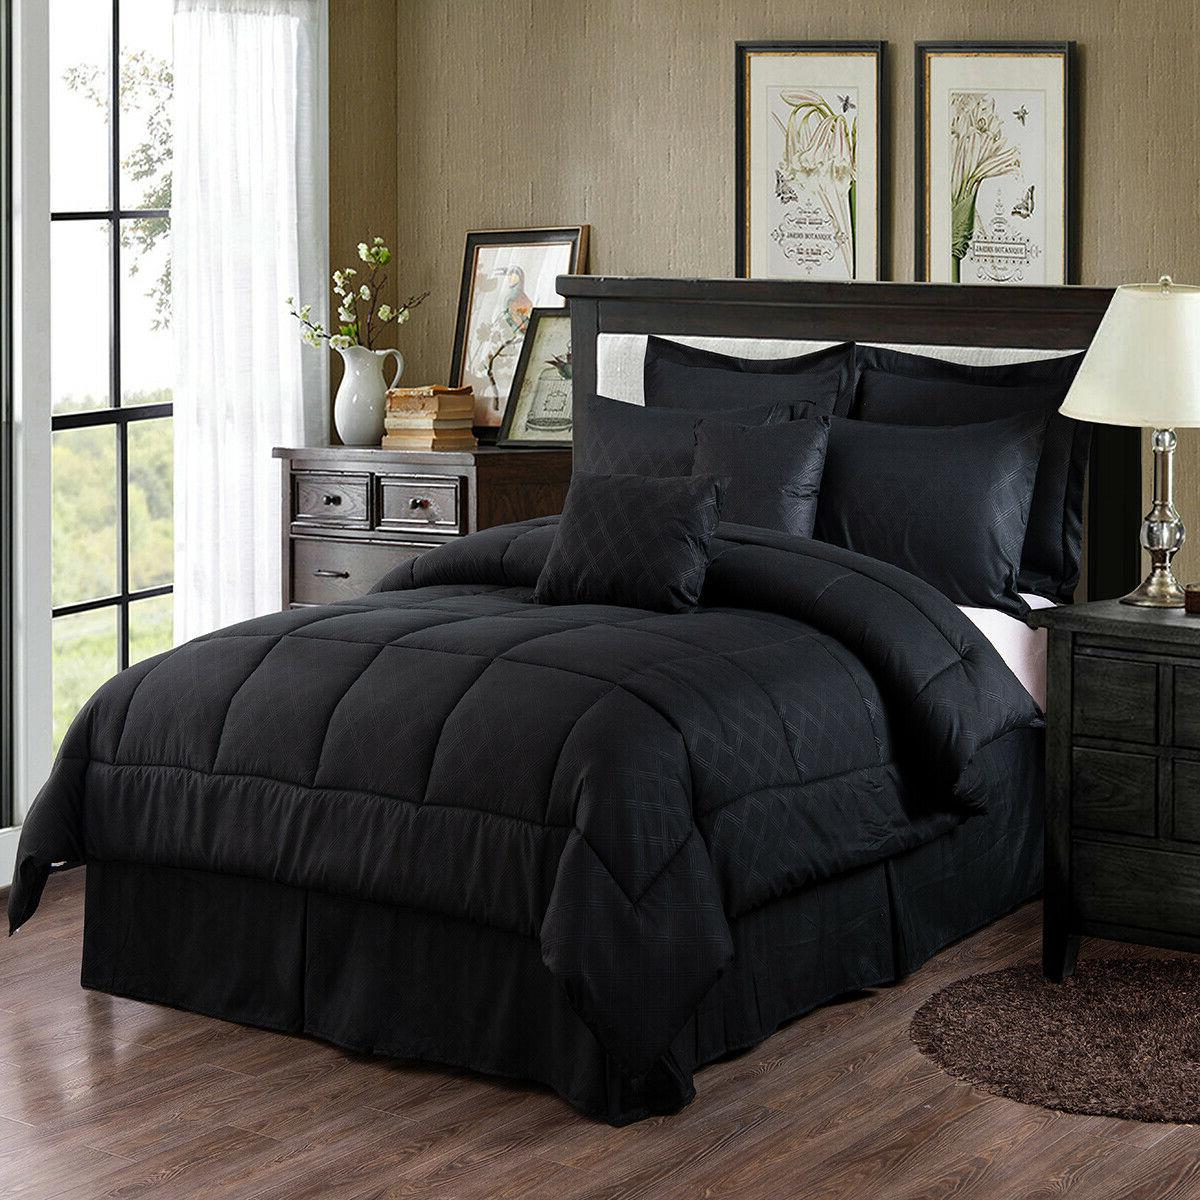 10 Piece Comforter Set Complete Bed in a Bag Comforter Beddi